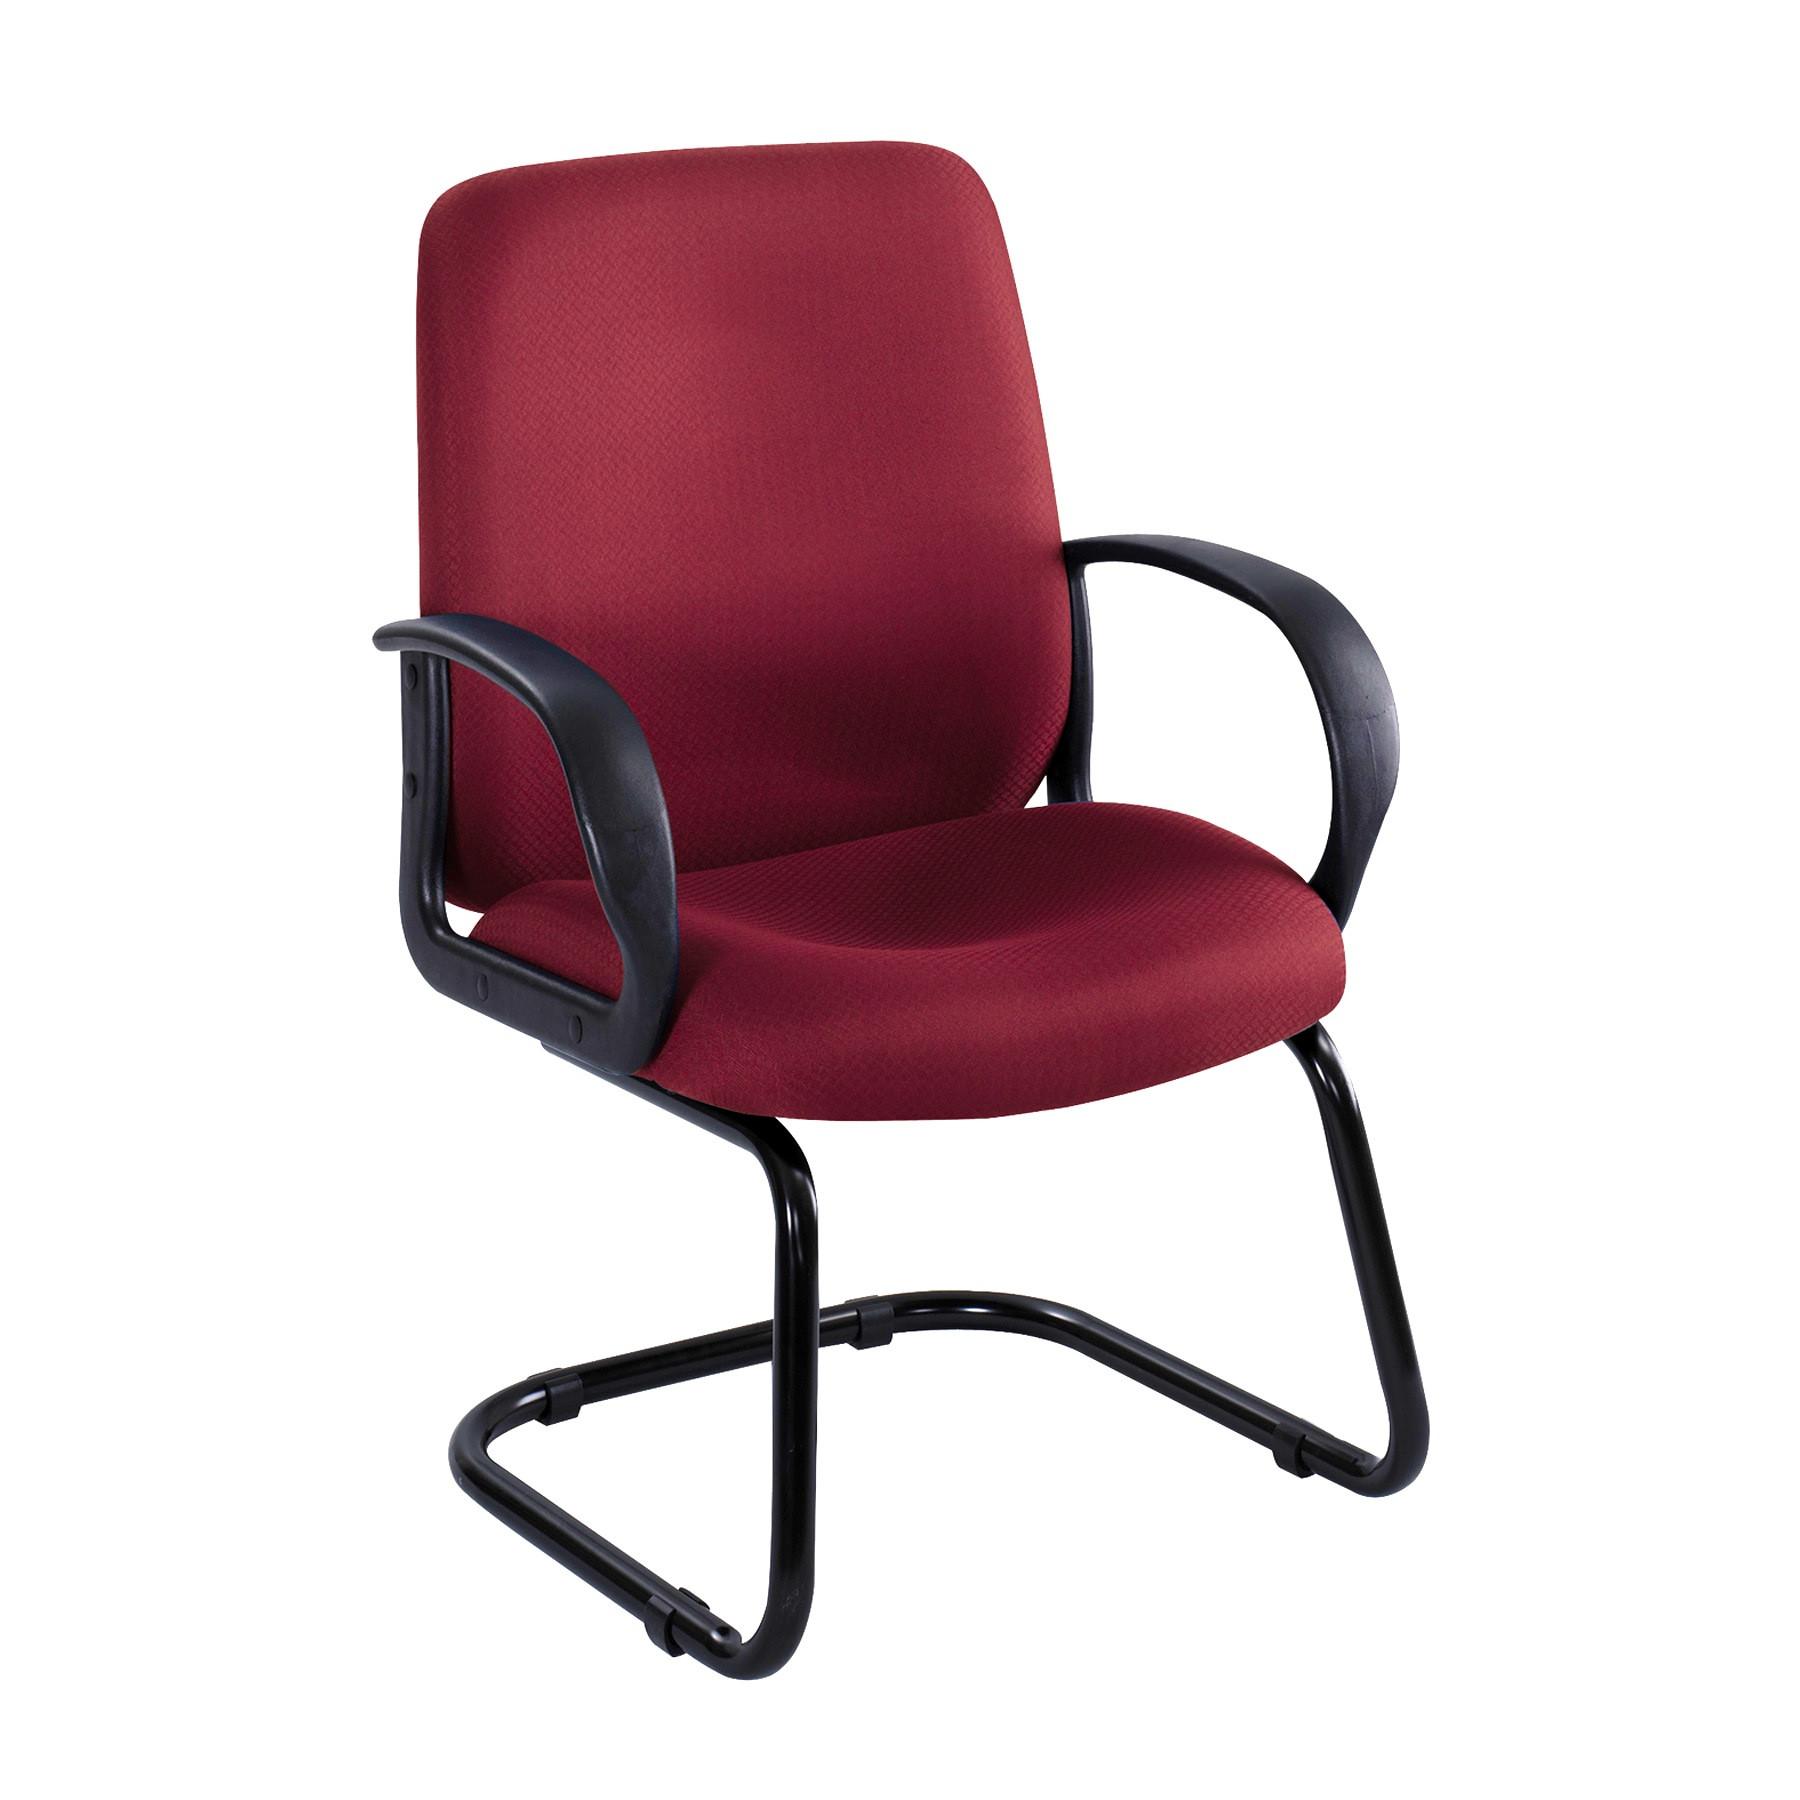 Best ideas about Cheap Desk Chair . Save or Pin Cheap fice Reception Chairs richfielduniversity Now.